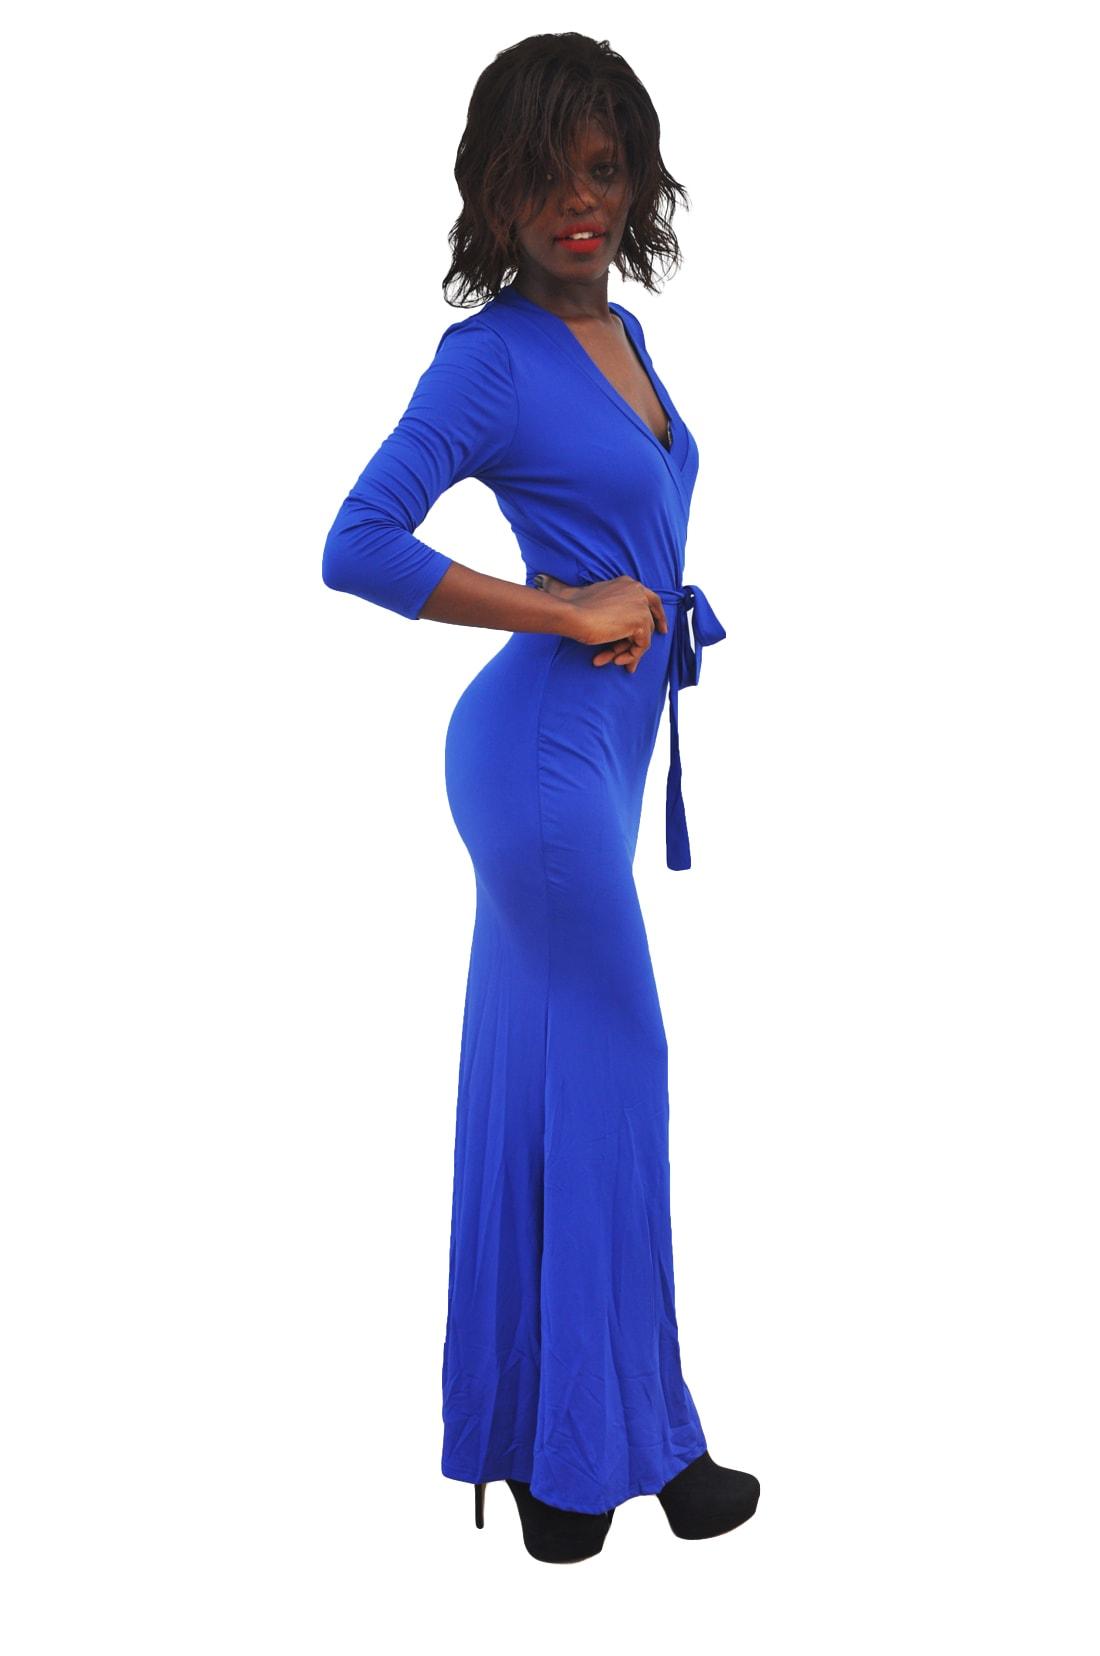 M0230 blue2 Long Sleeve Dresses maureens.com boutique